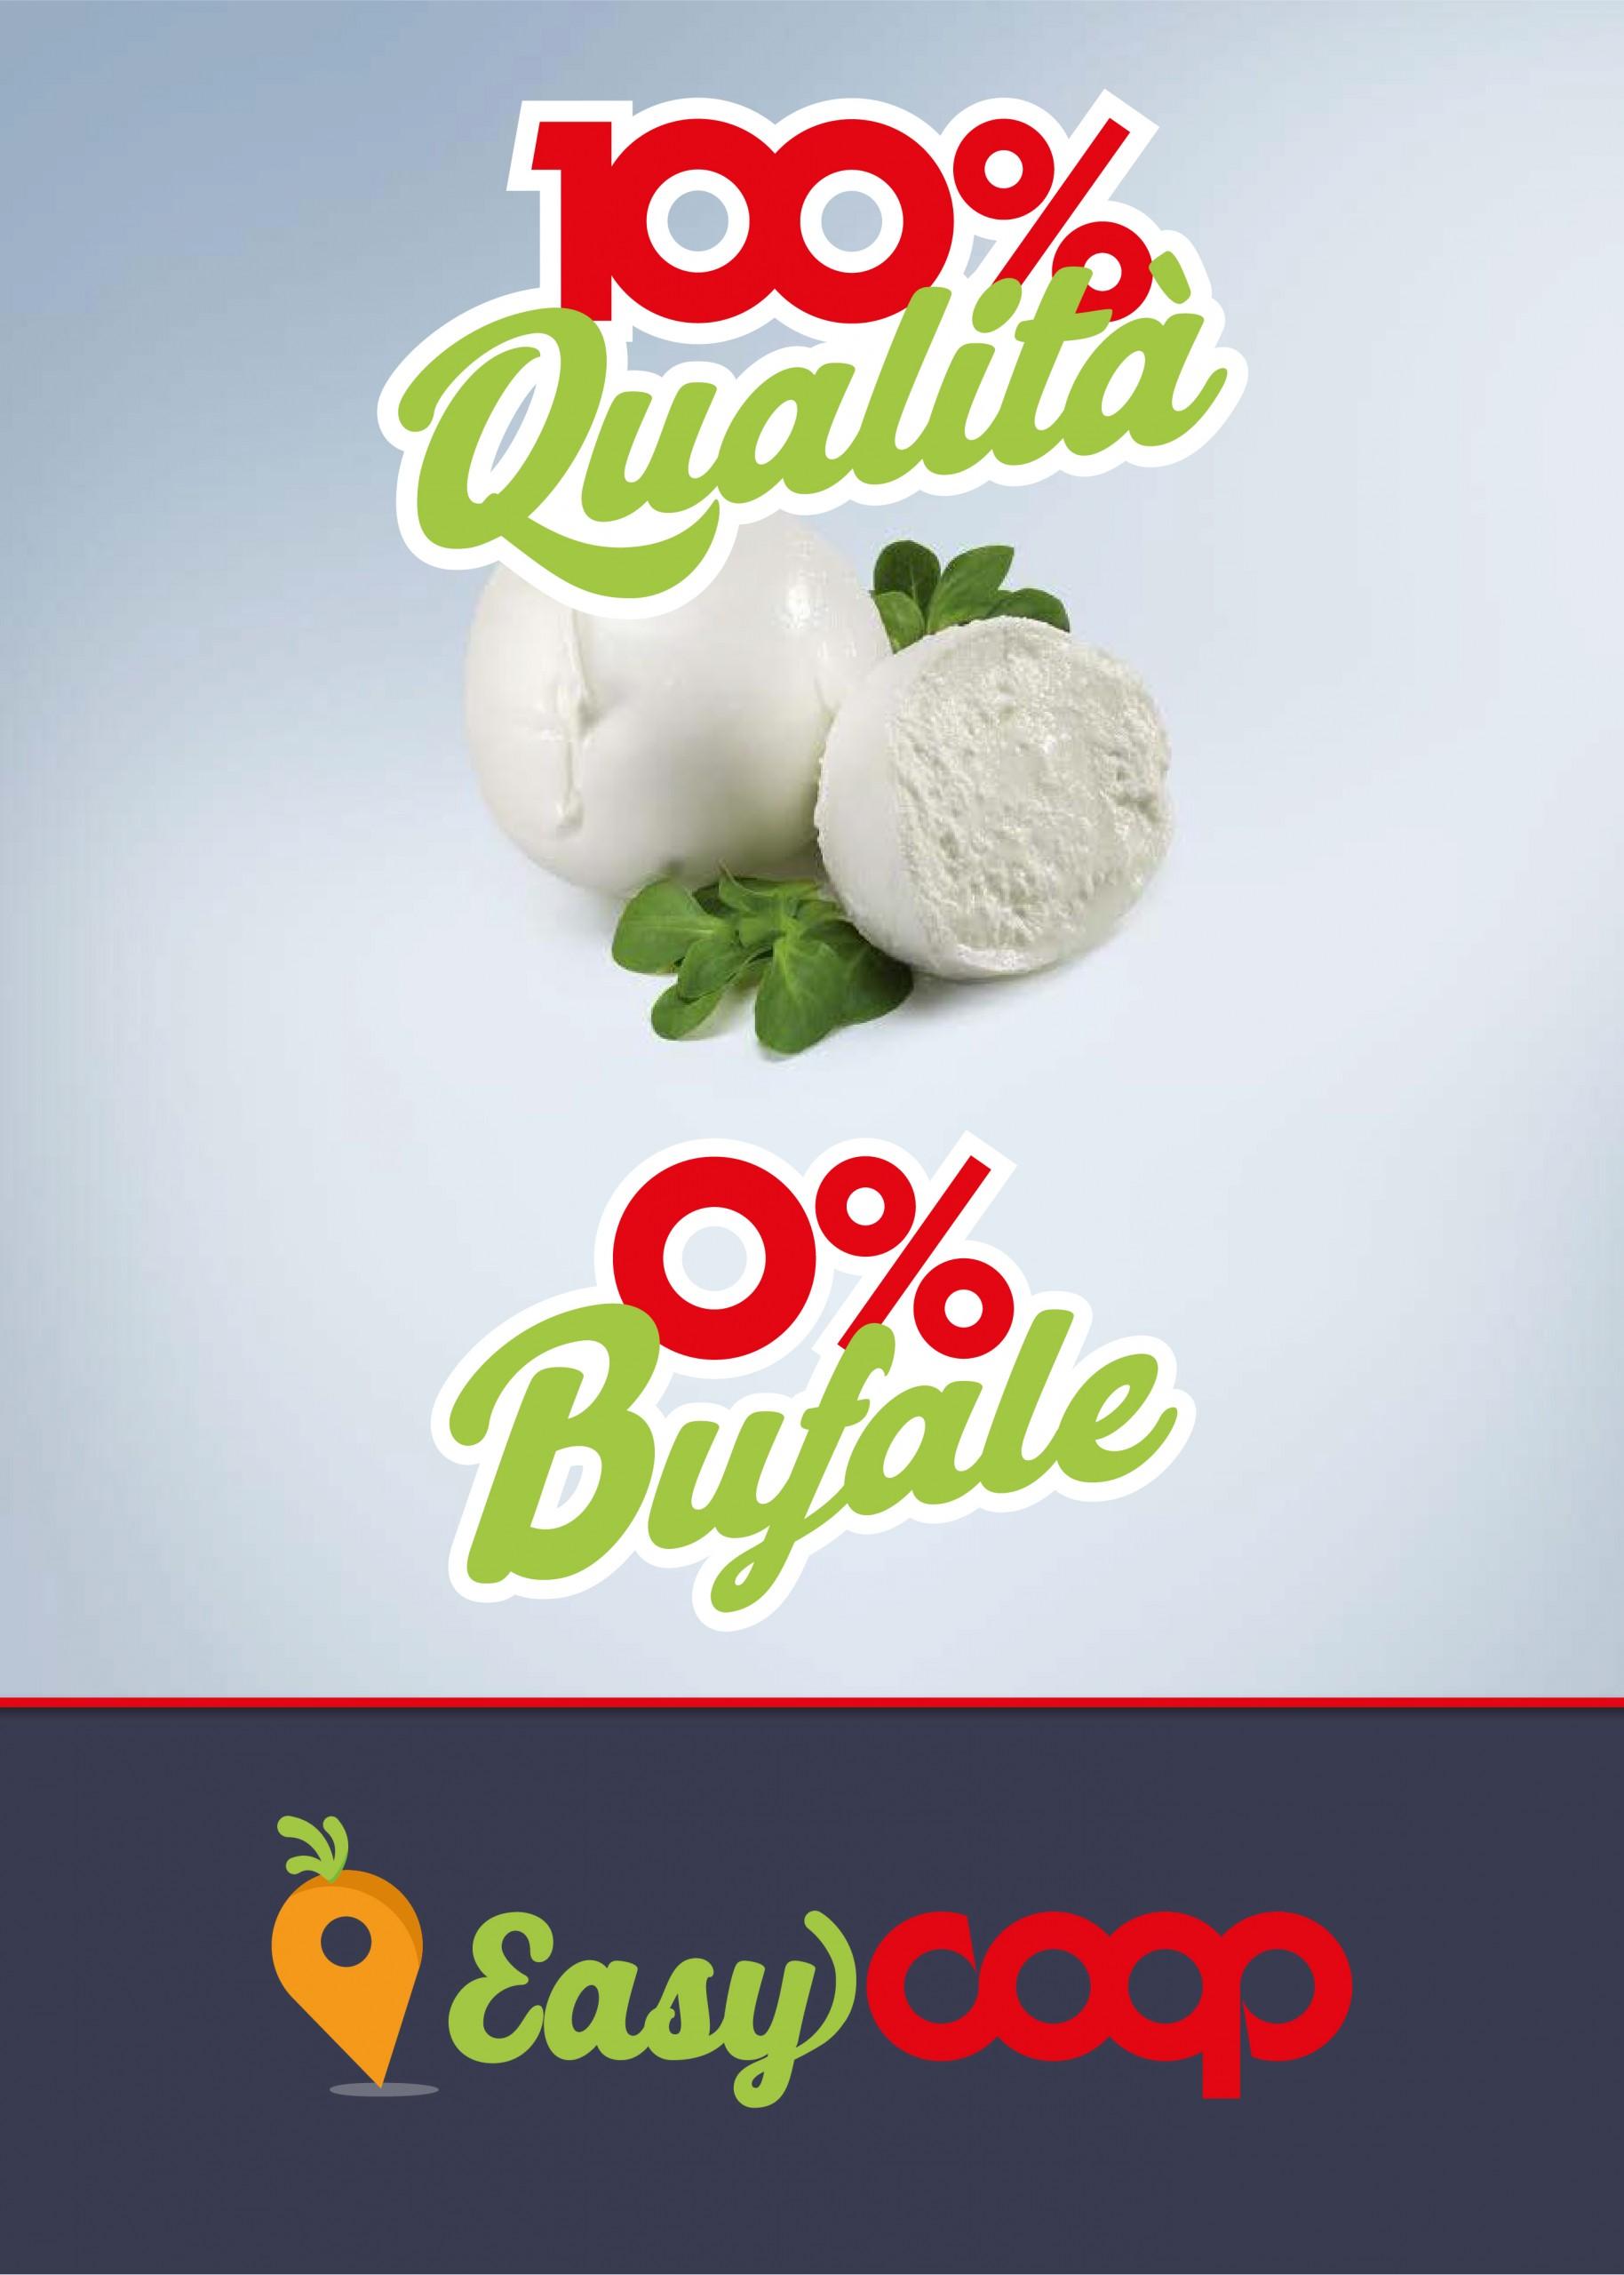 Luca Forlani Graphic Design EasyCoop poster 1